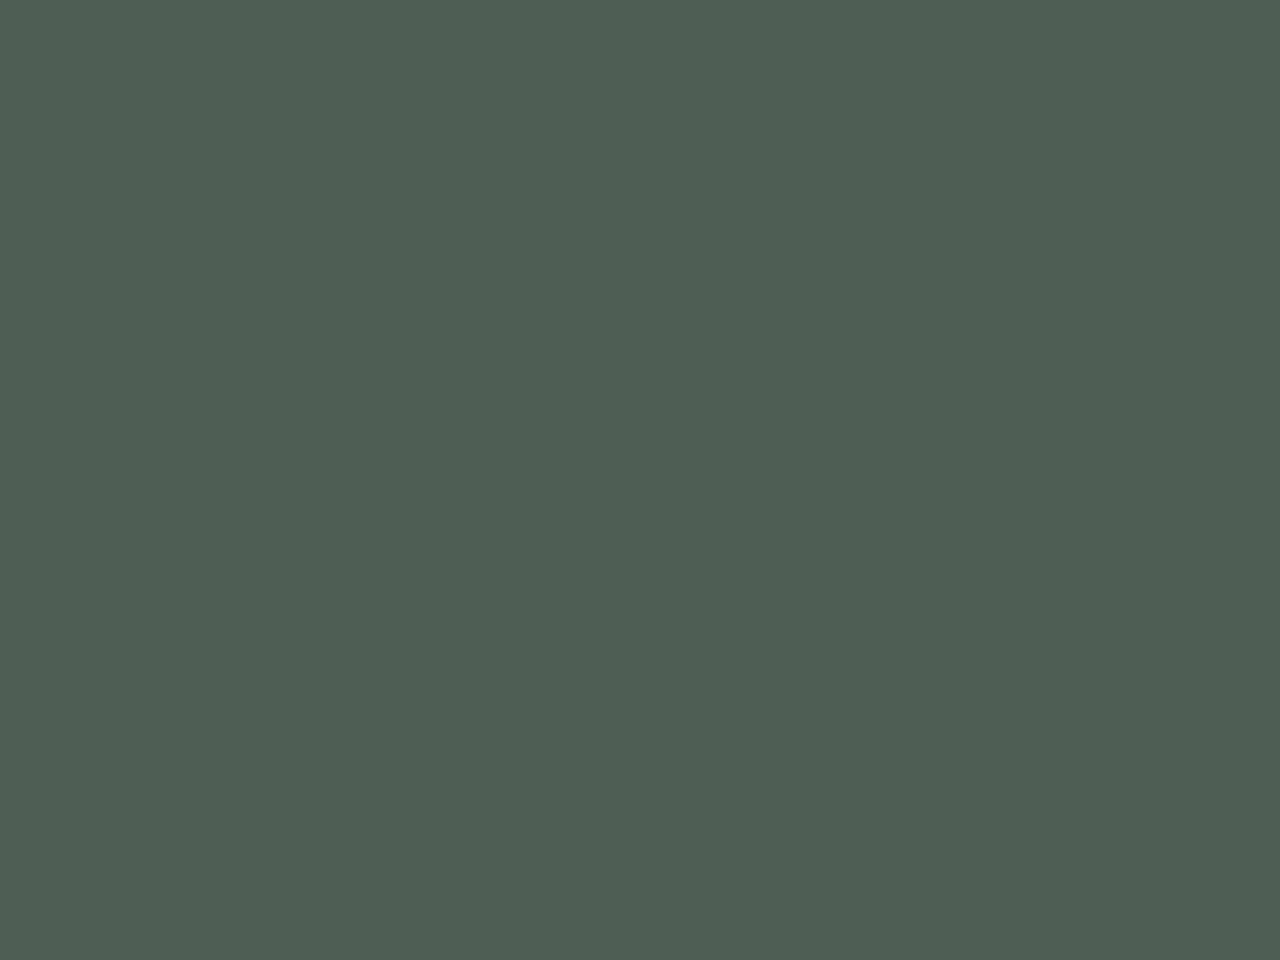 1280x960 Feldgrau Solid Color Background